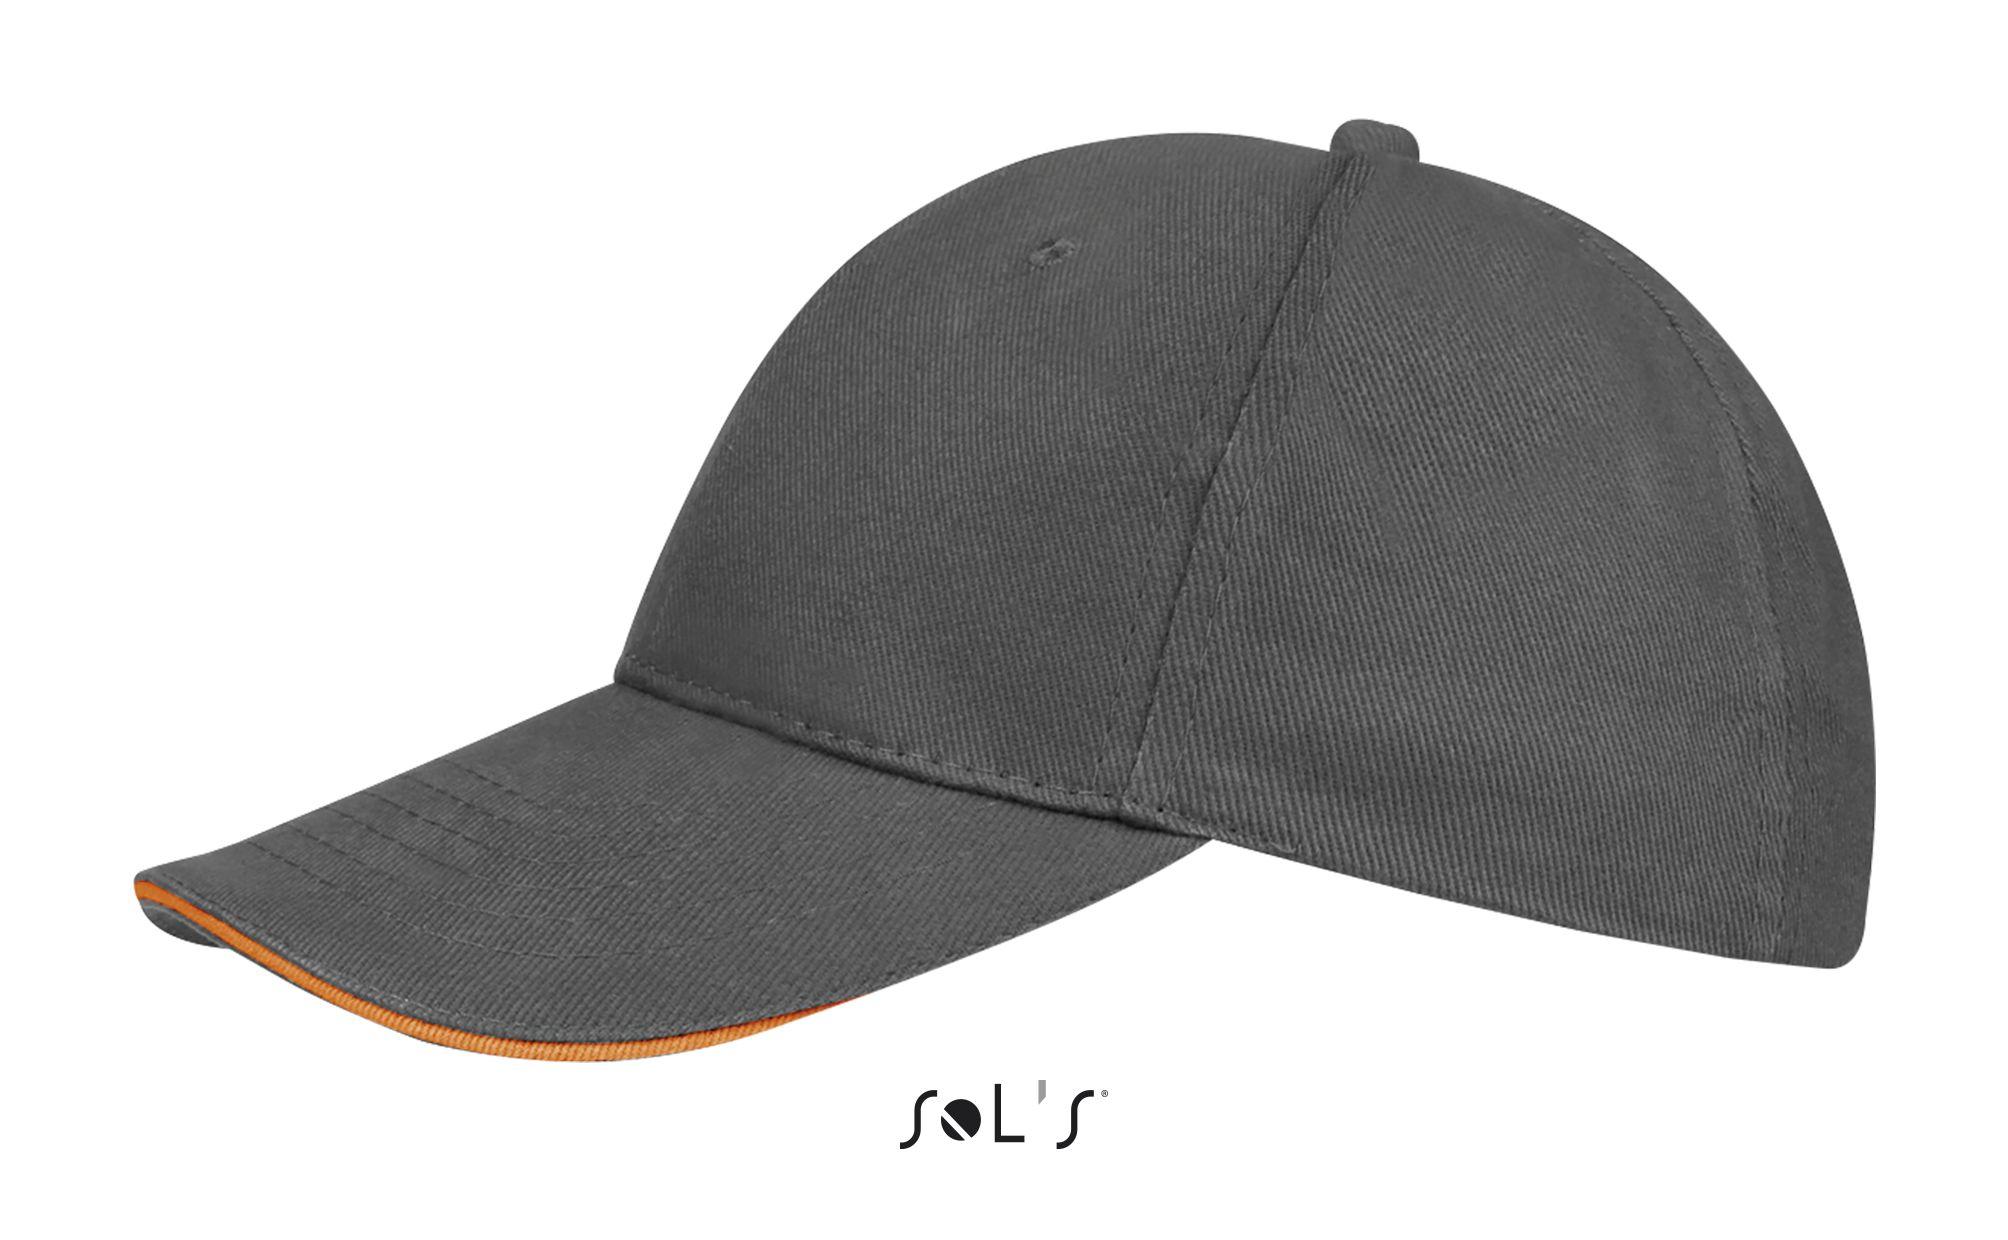 799 - Dark grey / Orange